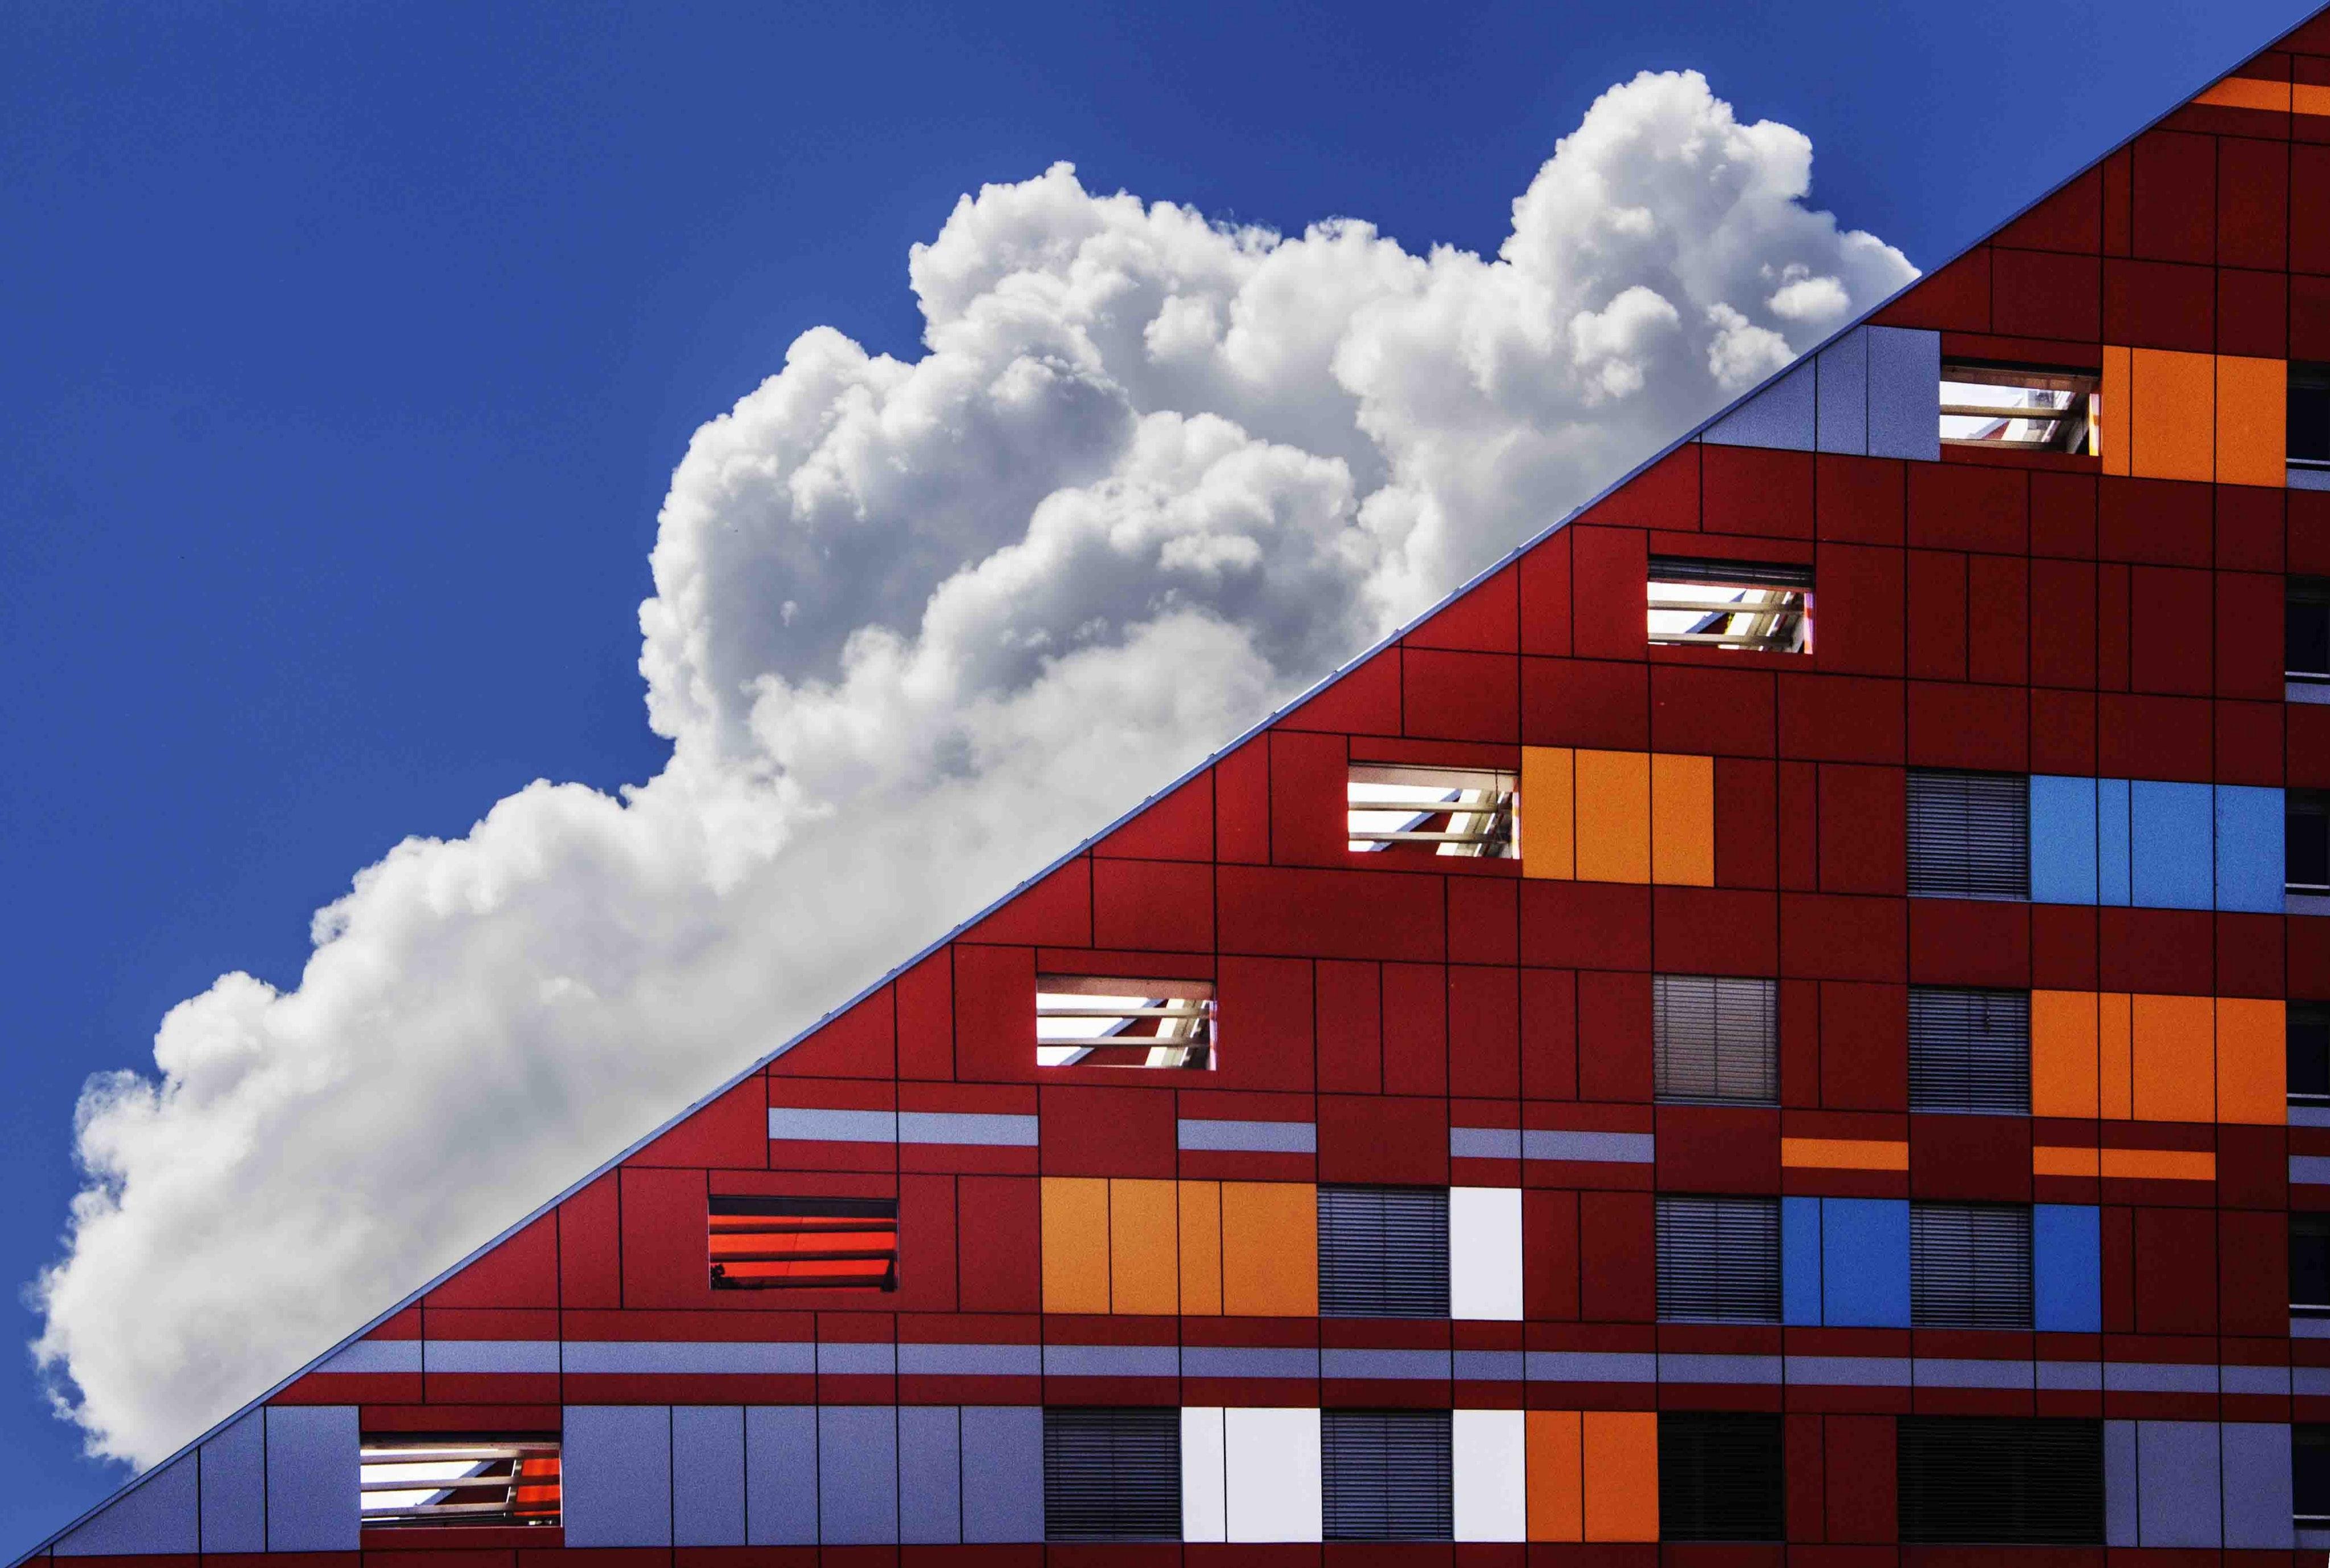 Iaas vs Paas vs SaaS: Cloud Model for your Business Needs